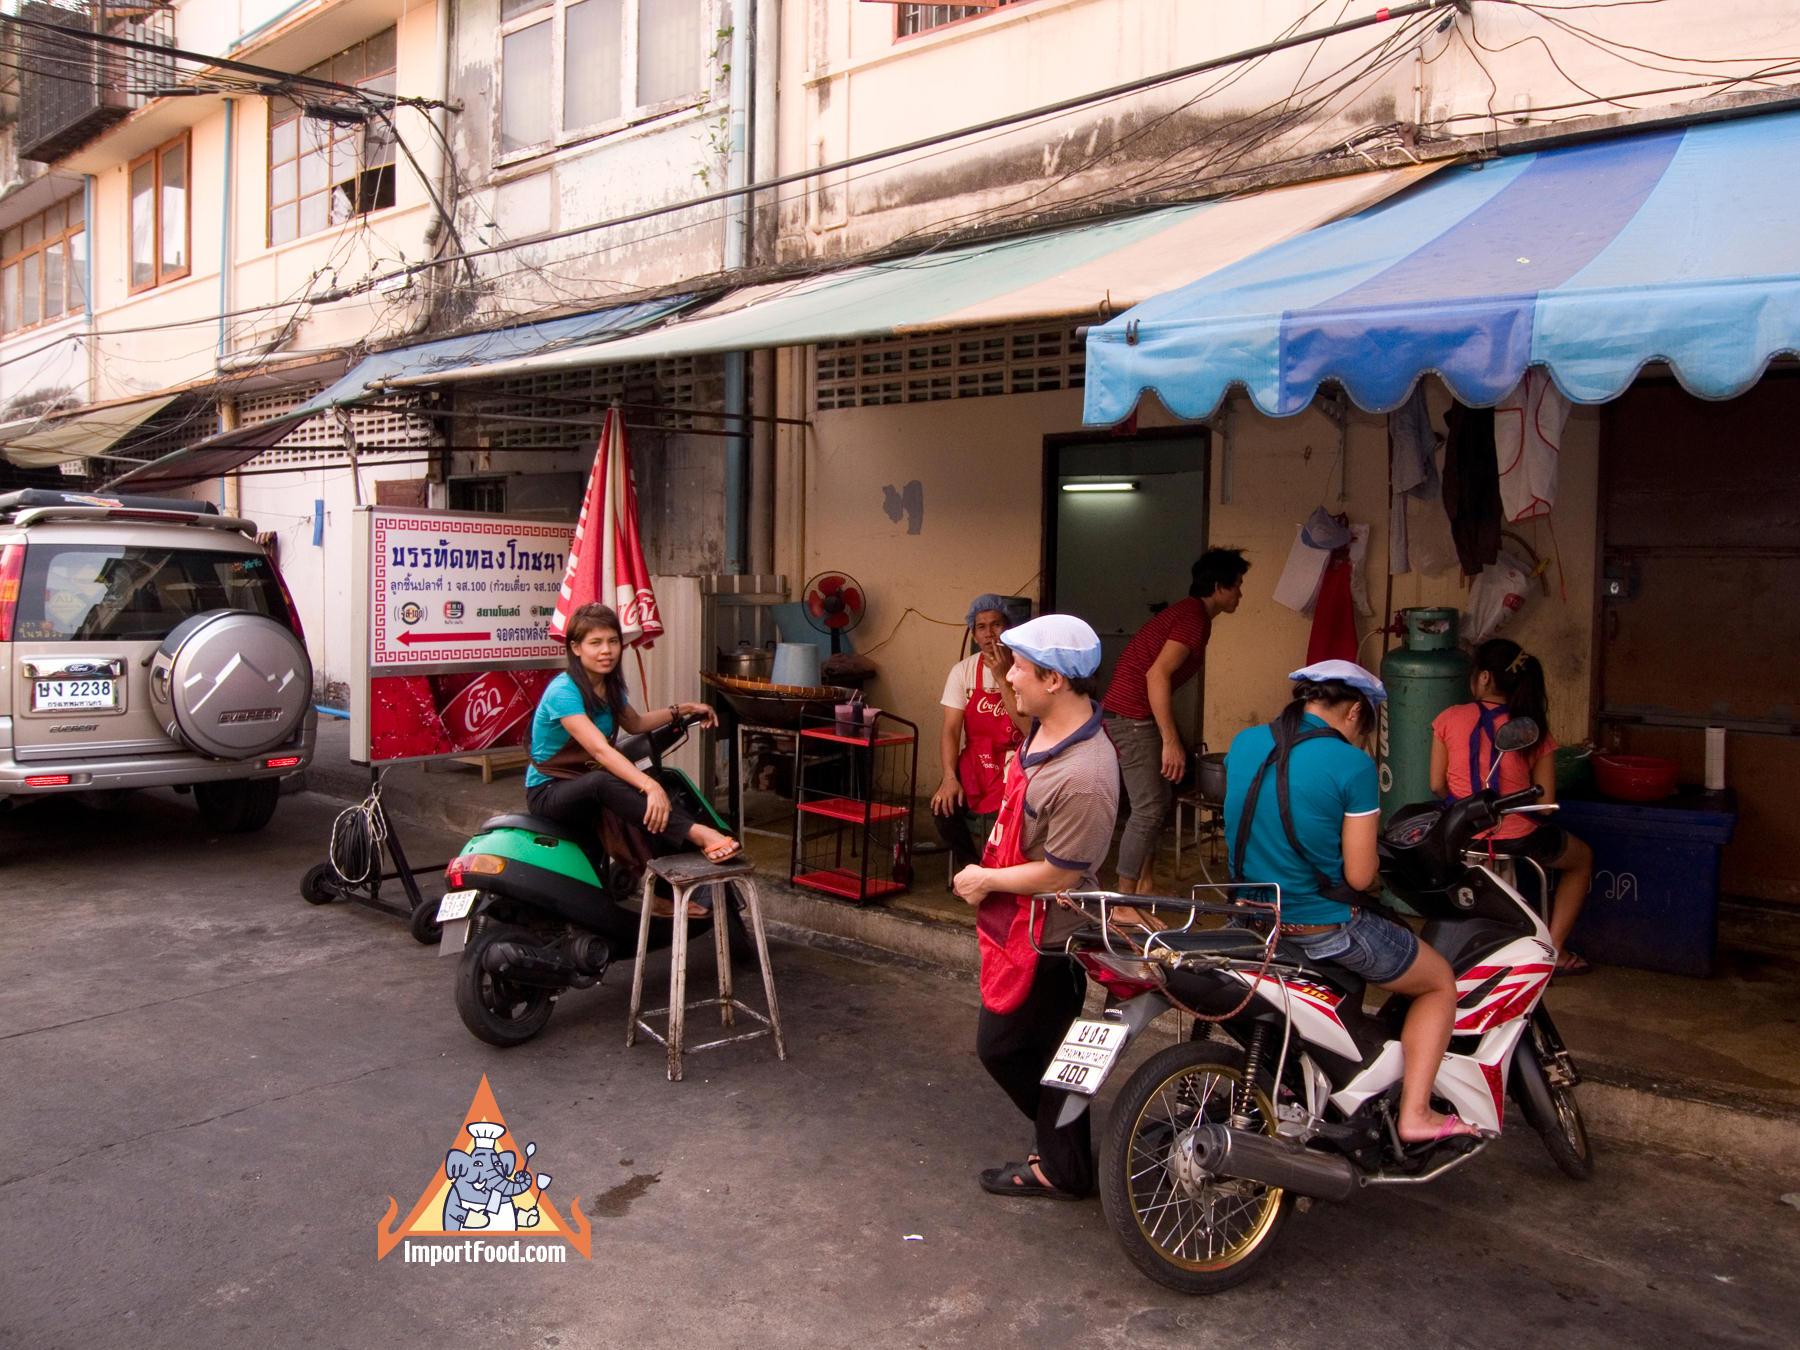 A Look Behind The Scenes of a Bangkok Noodle Shop